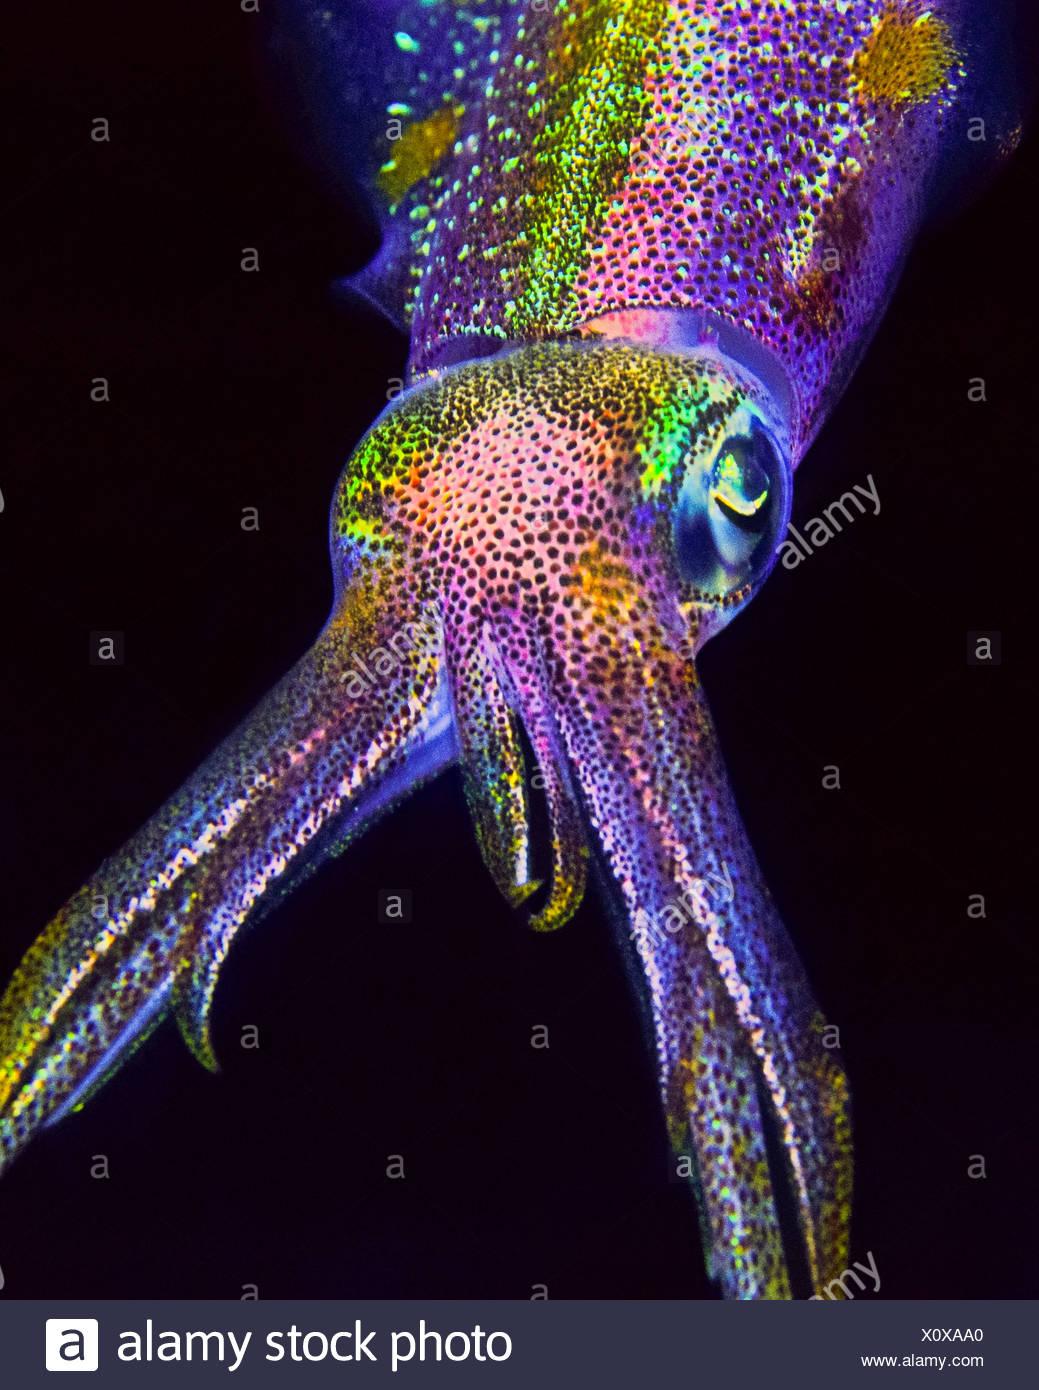 Barriera corallina caraibica calamari, Sepioteuthis sepioidea, Key Largo, Florida, Stati Uniti d'America Immagini Stock